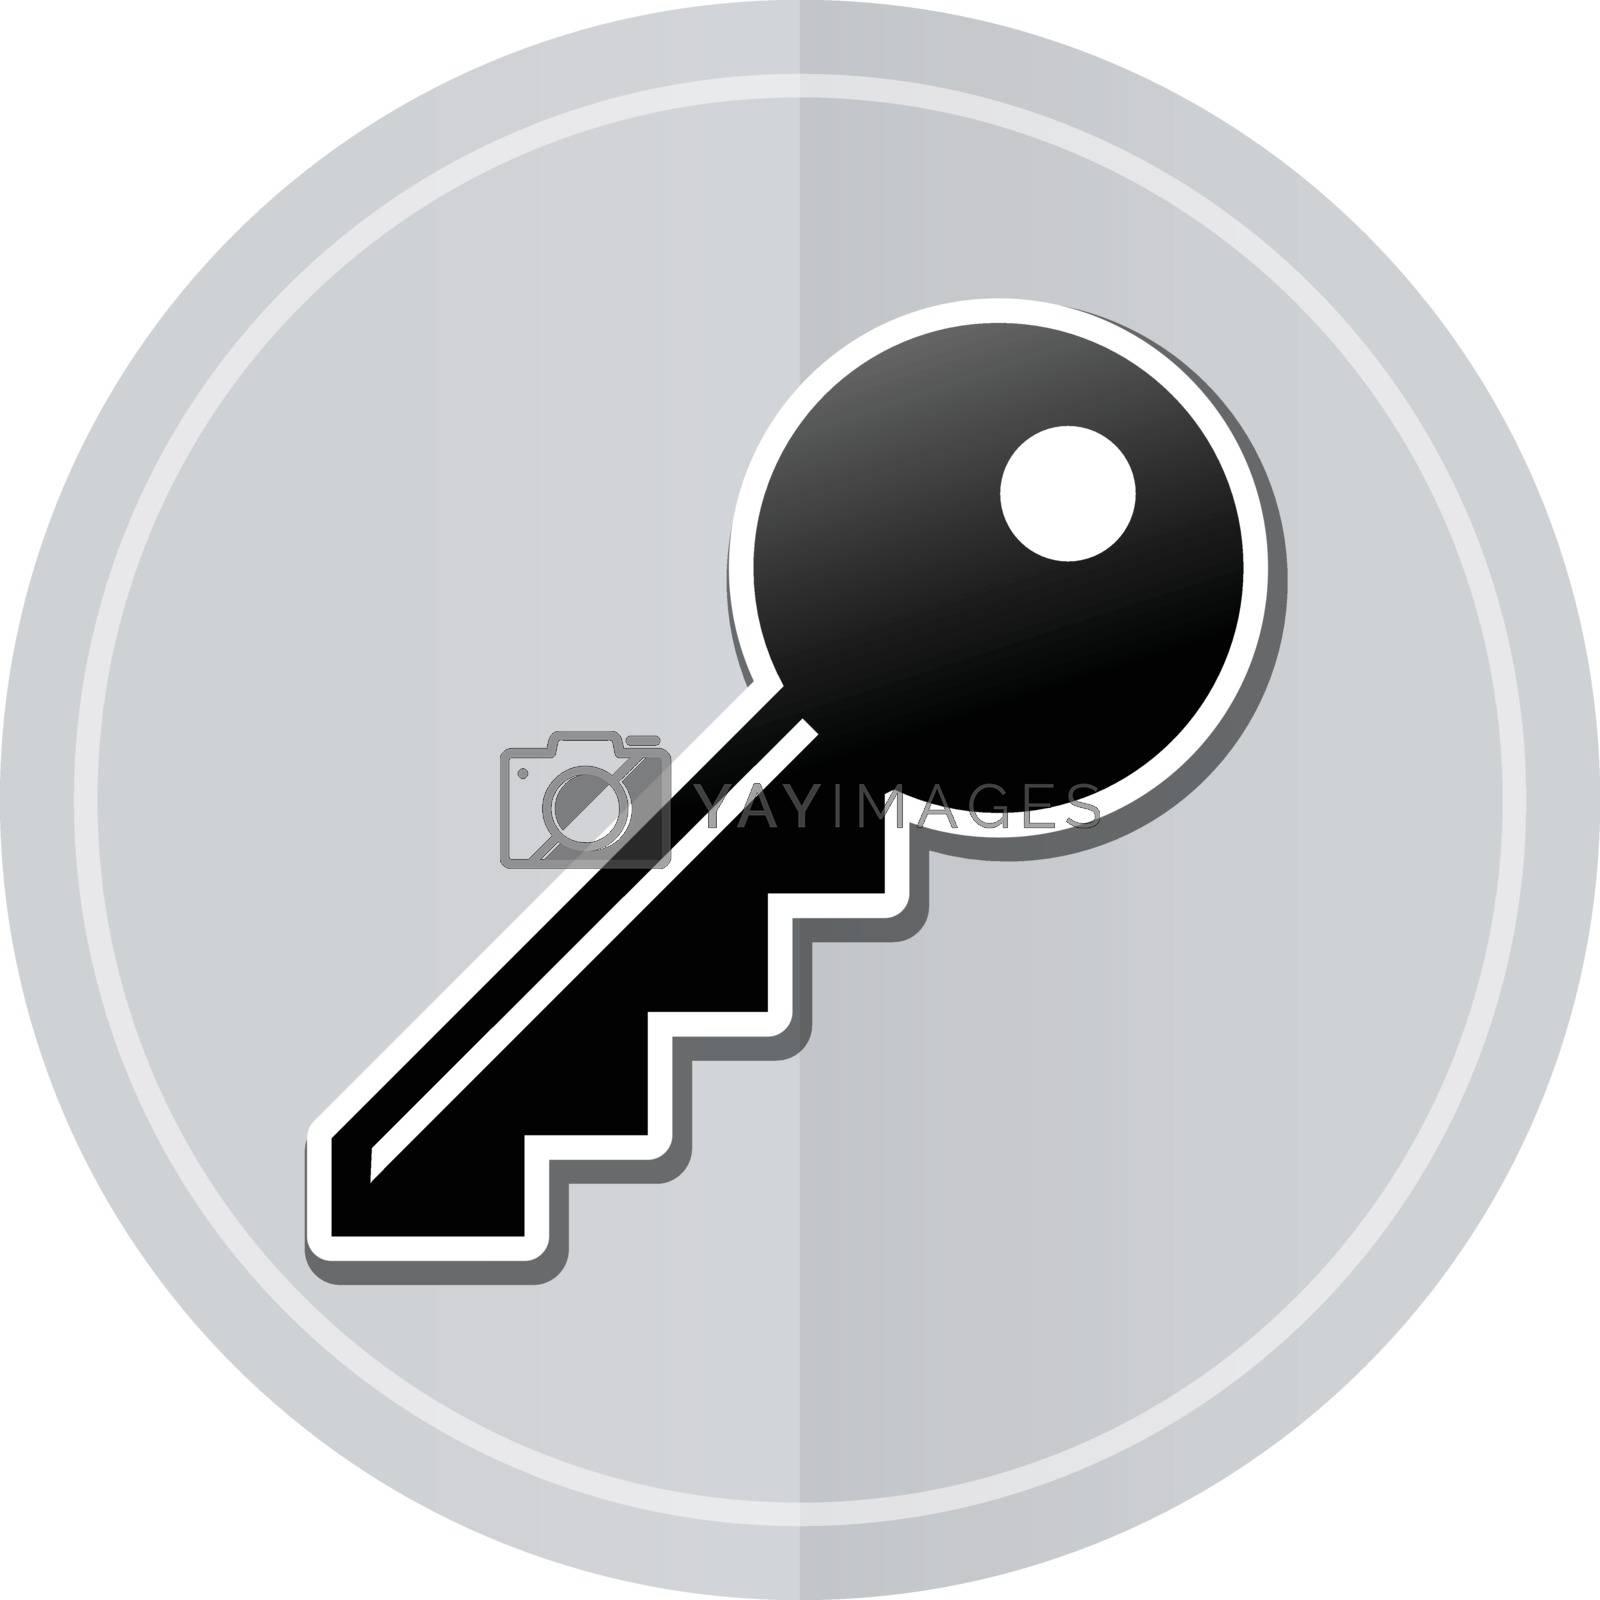 Illustration of key sticker icon simple design